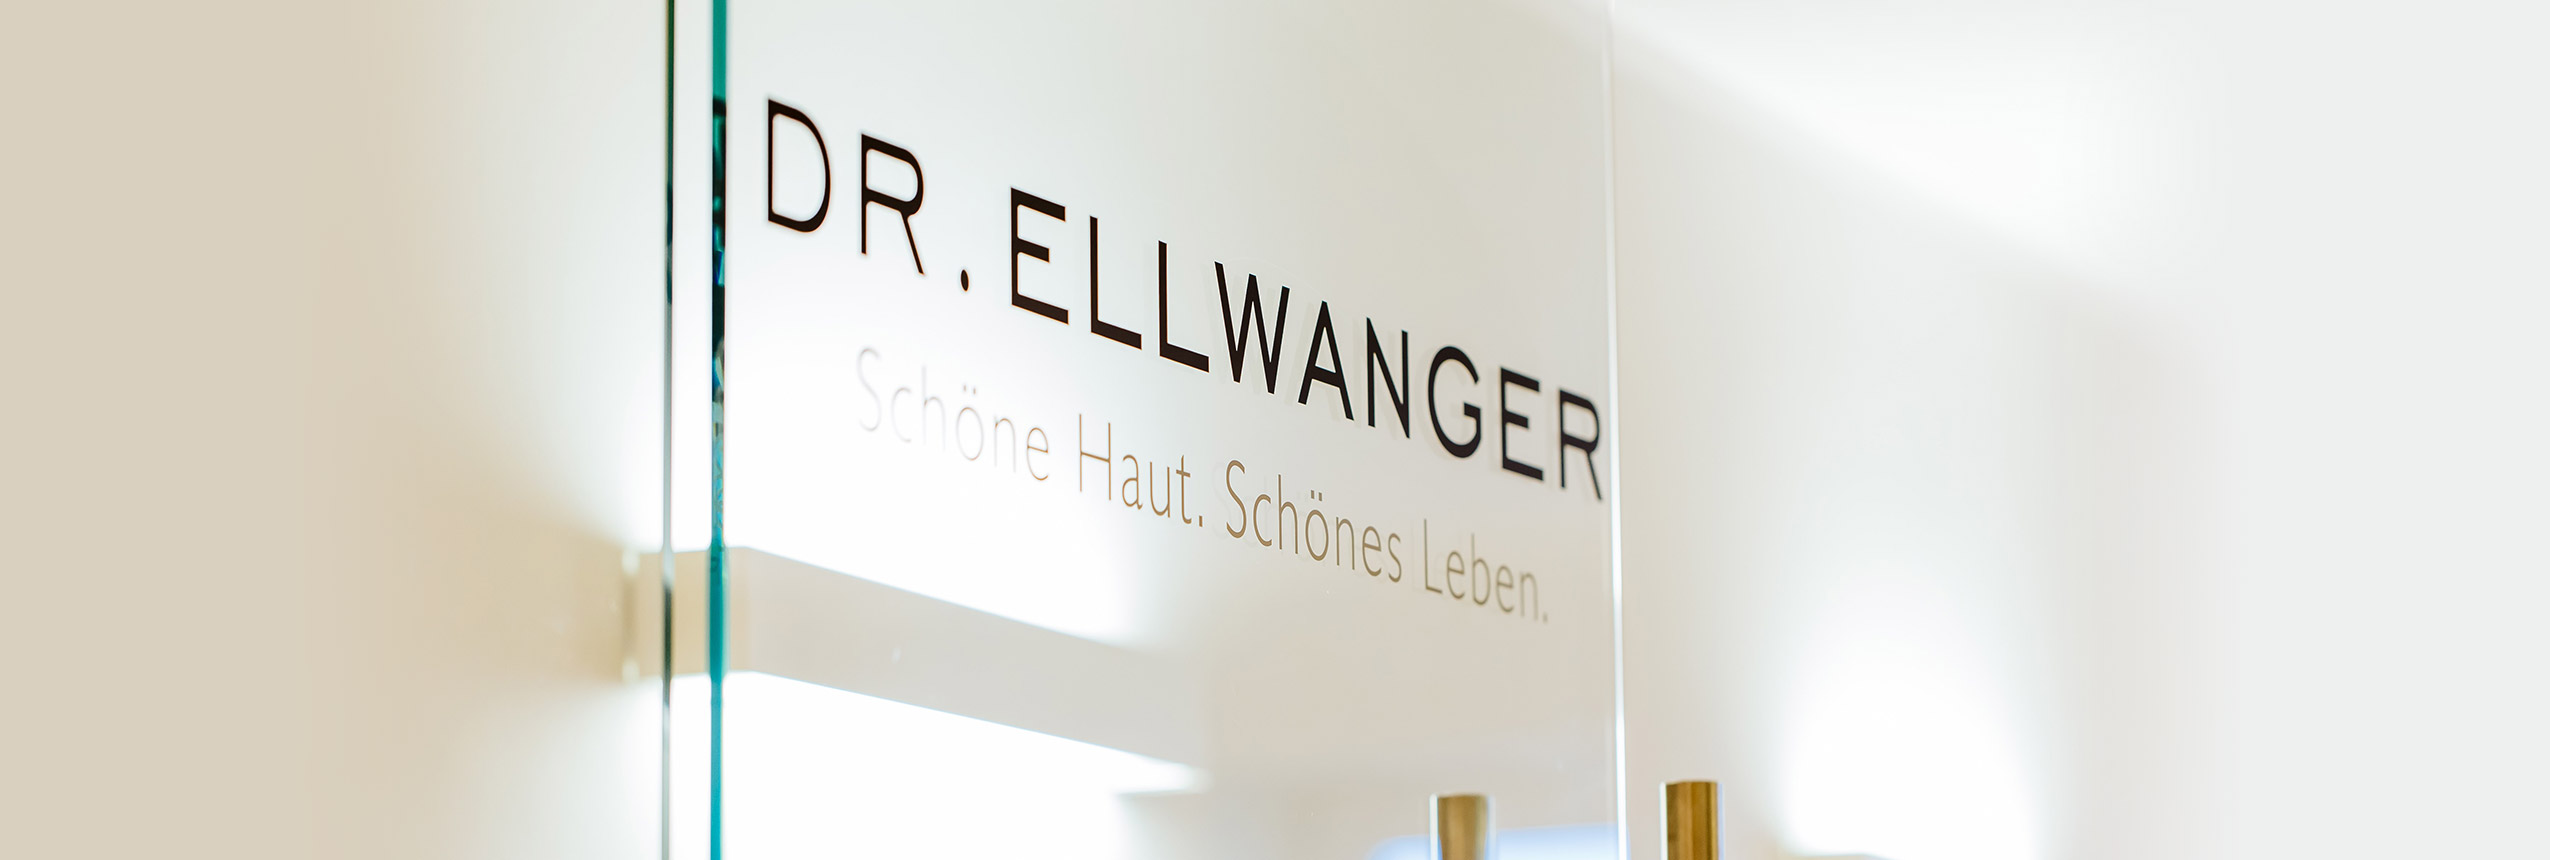 hautarzt in muenchen privatpraxis 02 - Dr. ellwanger